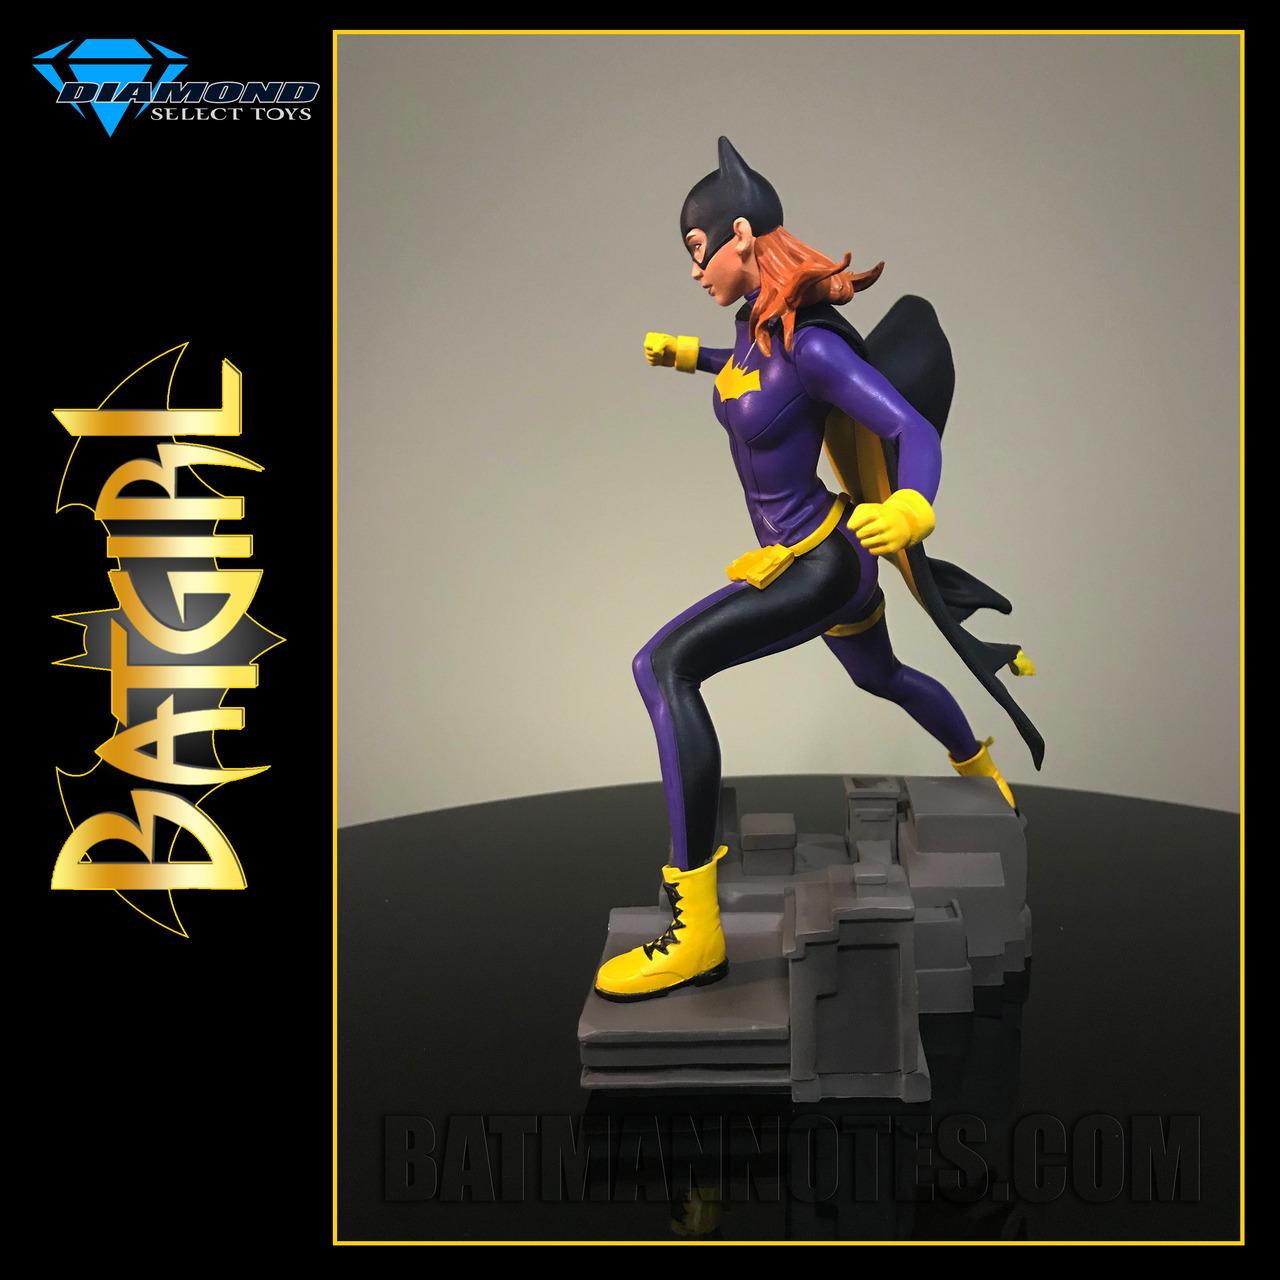 Daken Akihiro Marvel Son Of Wolverine Toys Gifts Building Blocks Collection 2019